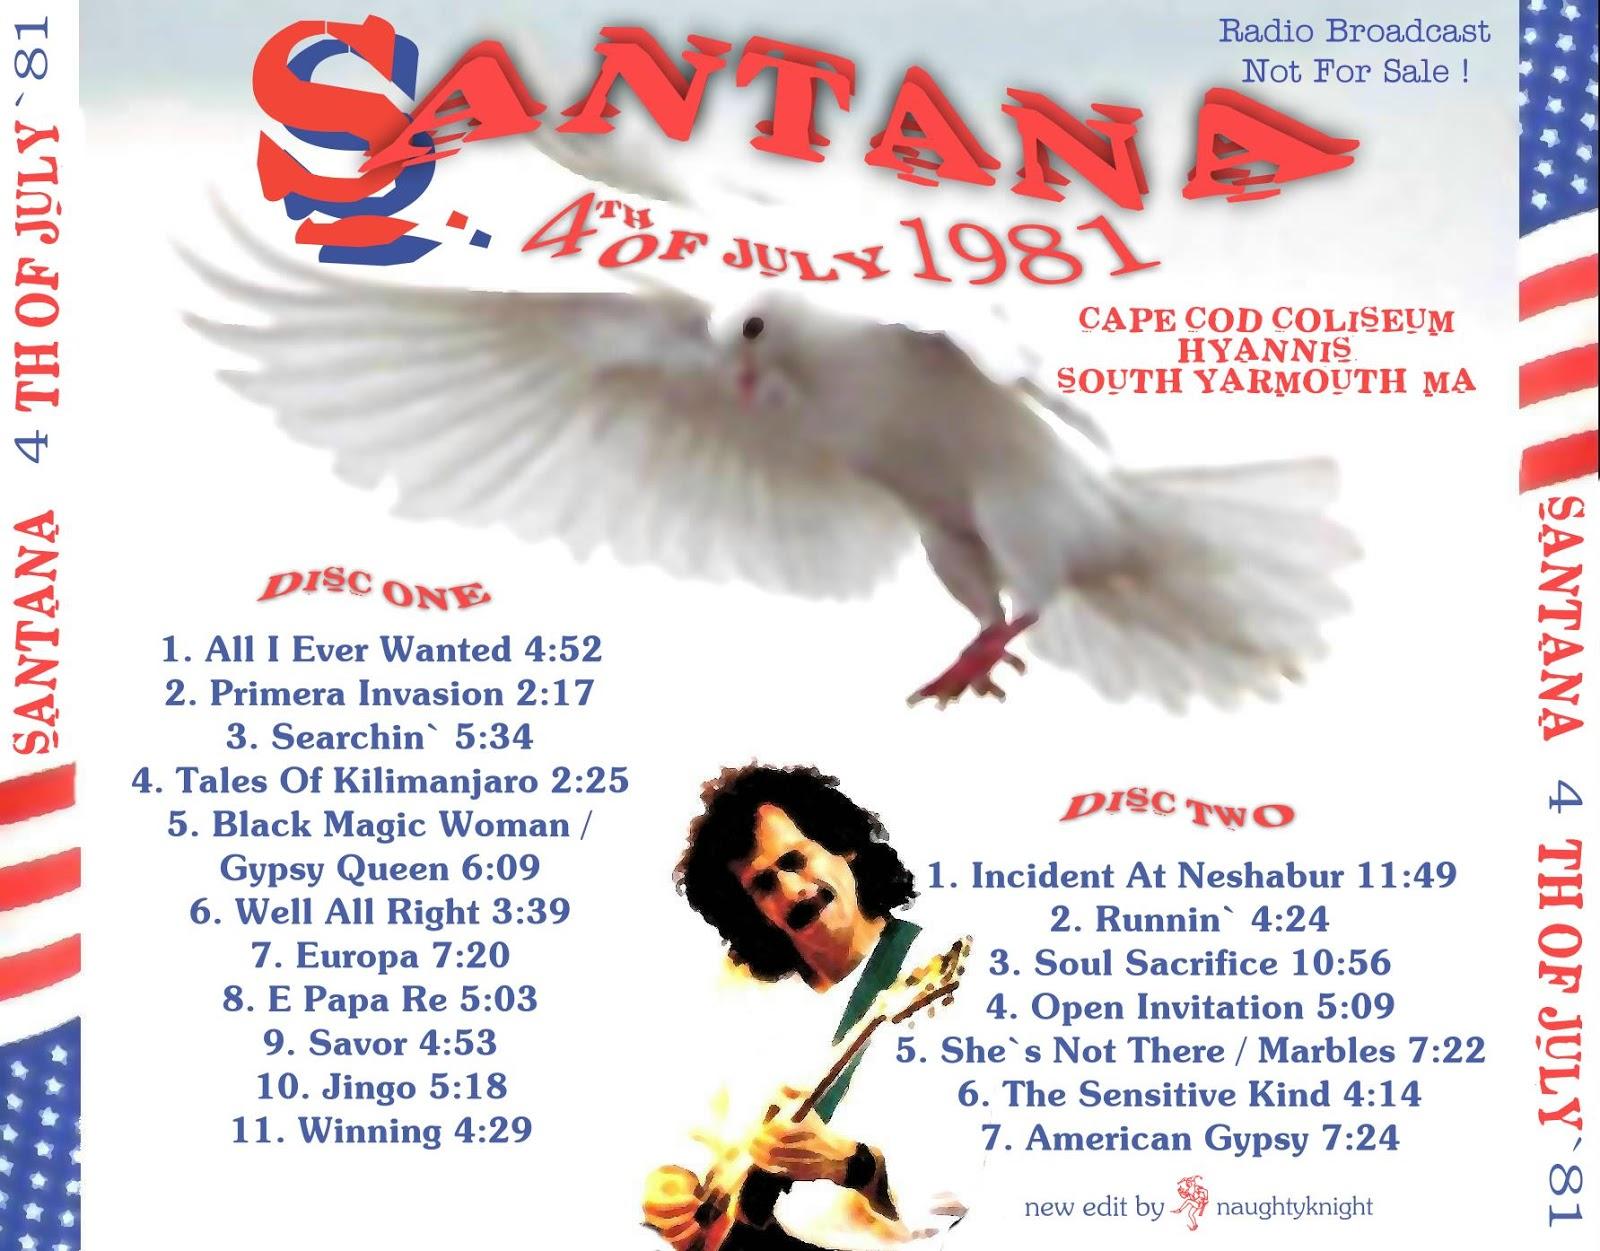 Open Invitation Santana was awesome invitation layout